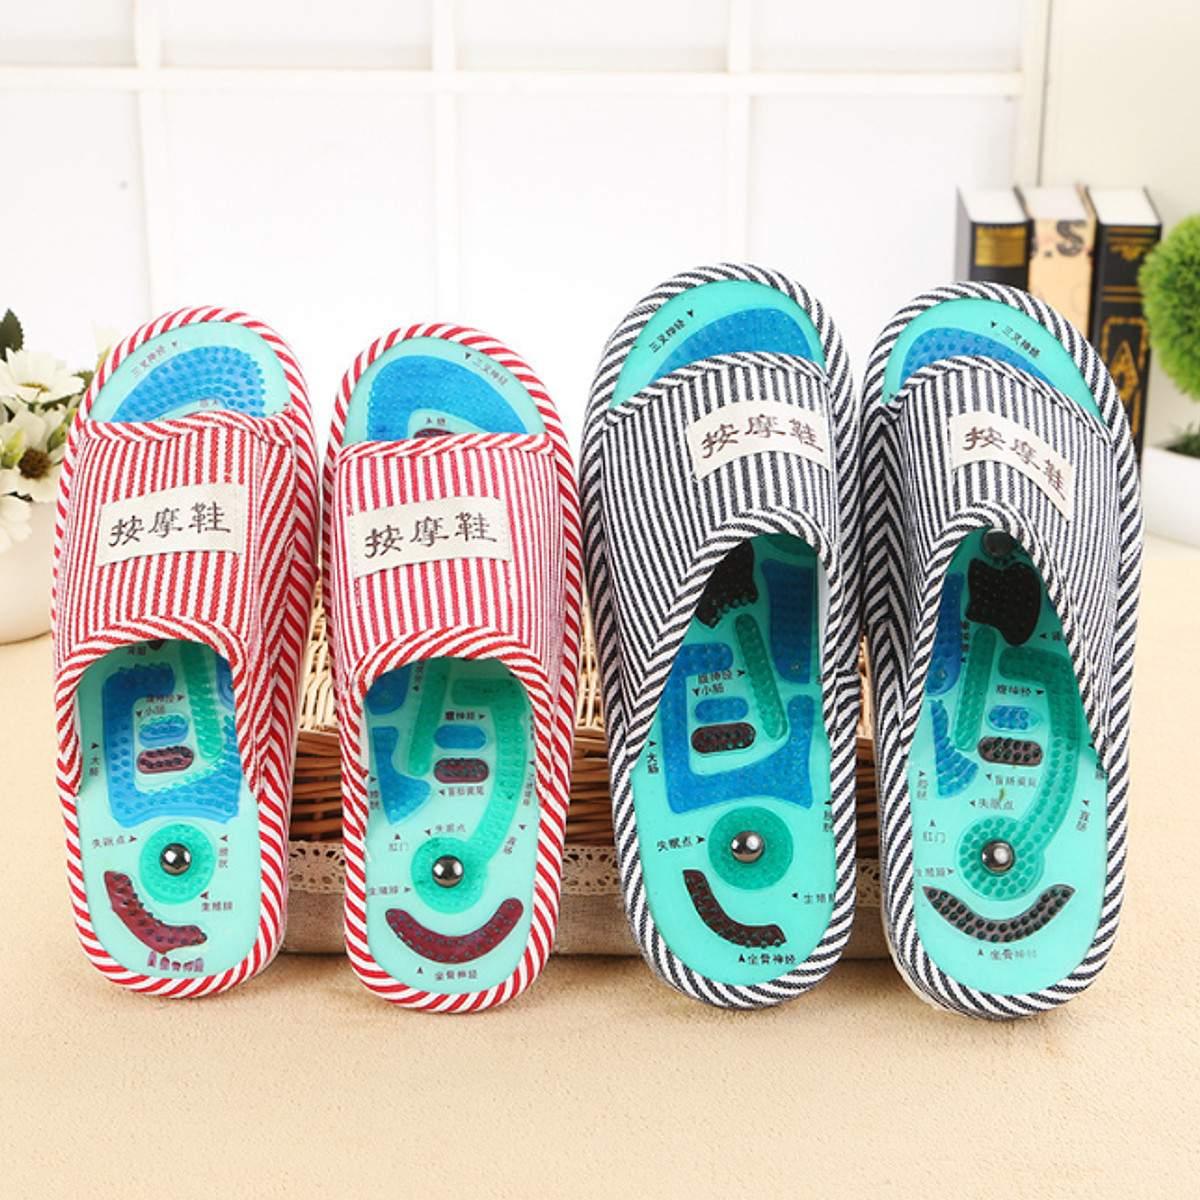 1 Paar Ssential Gesundheit Pflege Taichi Akupunktur Massage Hausschuhe Hohe Qualität Männer Der Fuß Massage Hausschuhe Mit Magnet Hause Schuhe